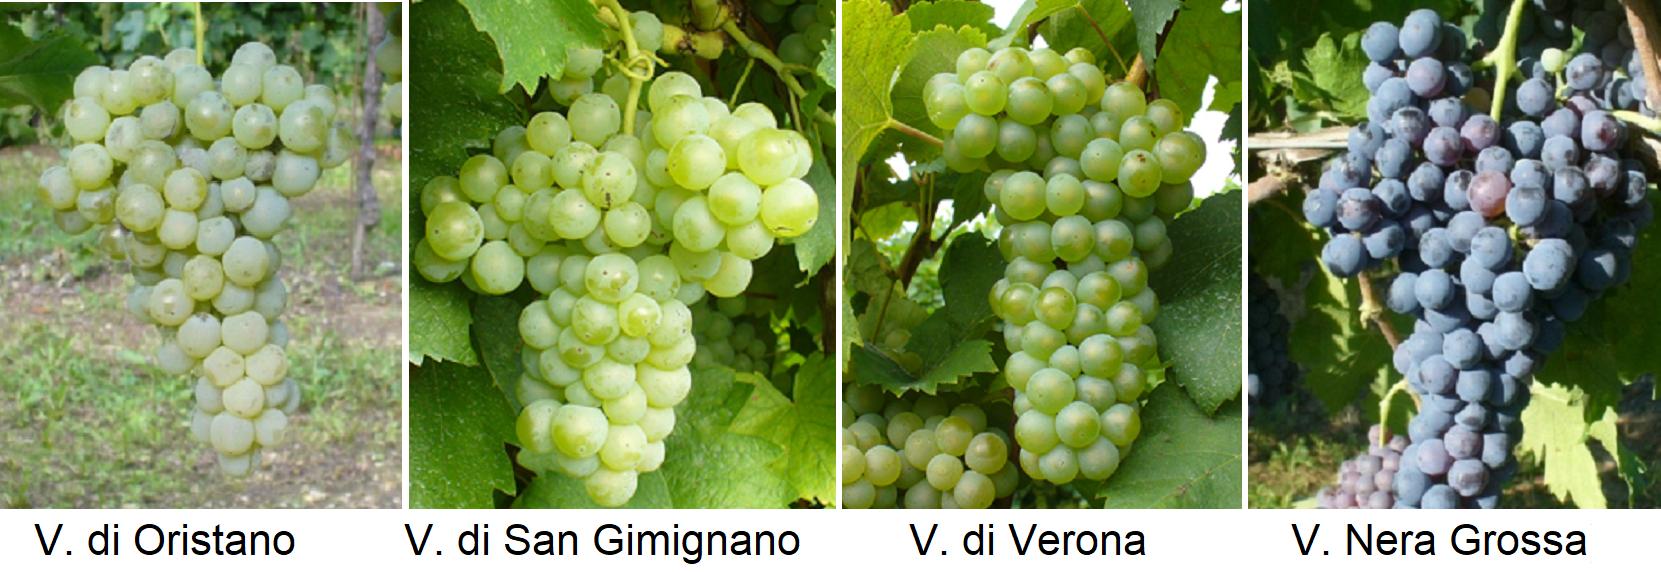 ernaccia - V. di Oristano, V. di San Gimignano, V. di Verona, V. Nera Grossa